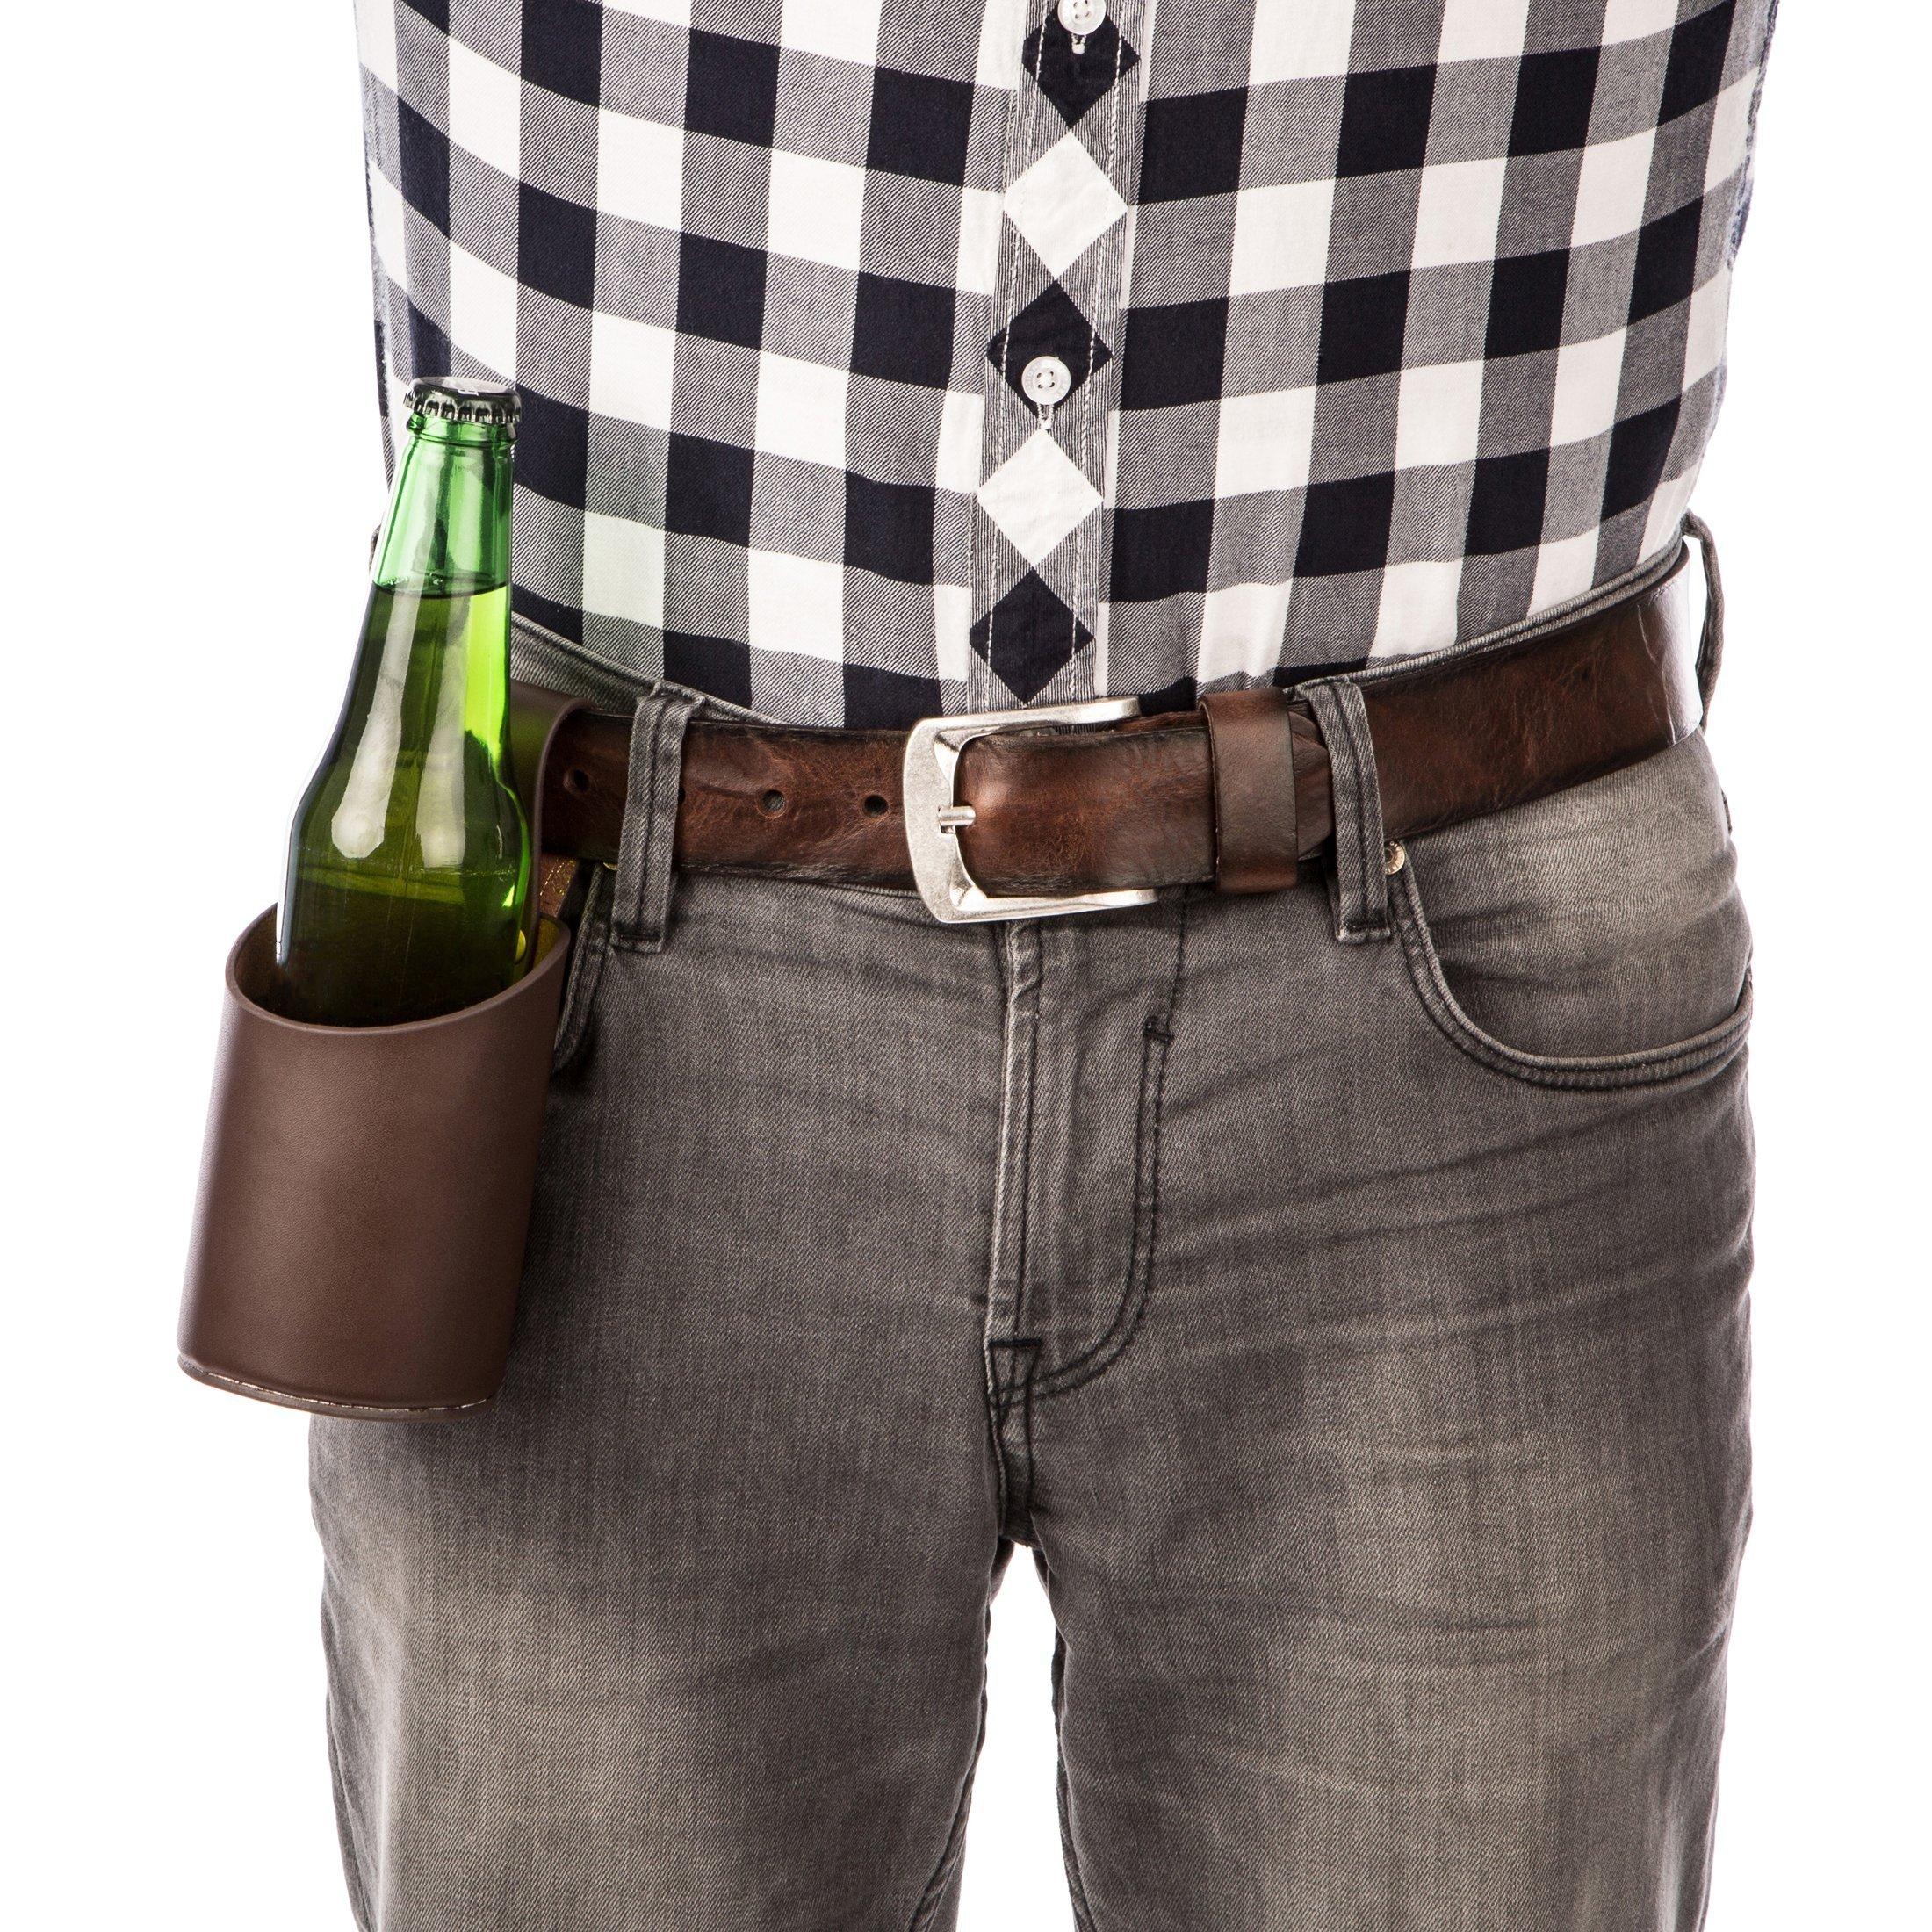 Compra Levivo Cartuchera para cerveza / cartuchera de cuero para ...